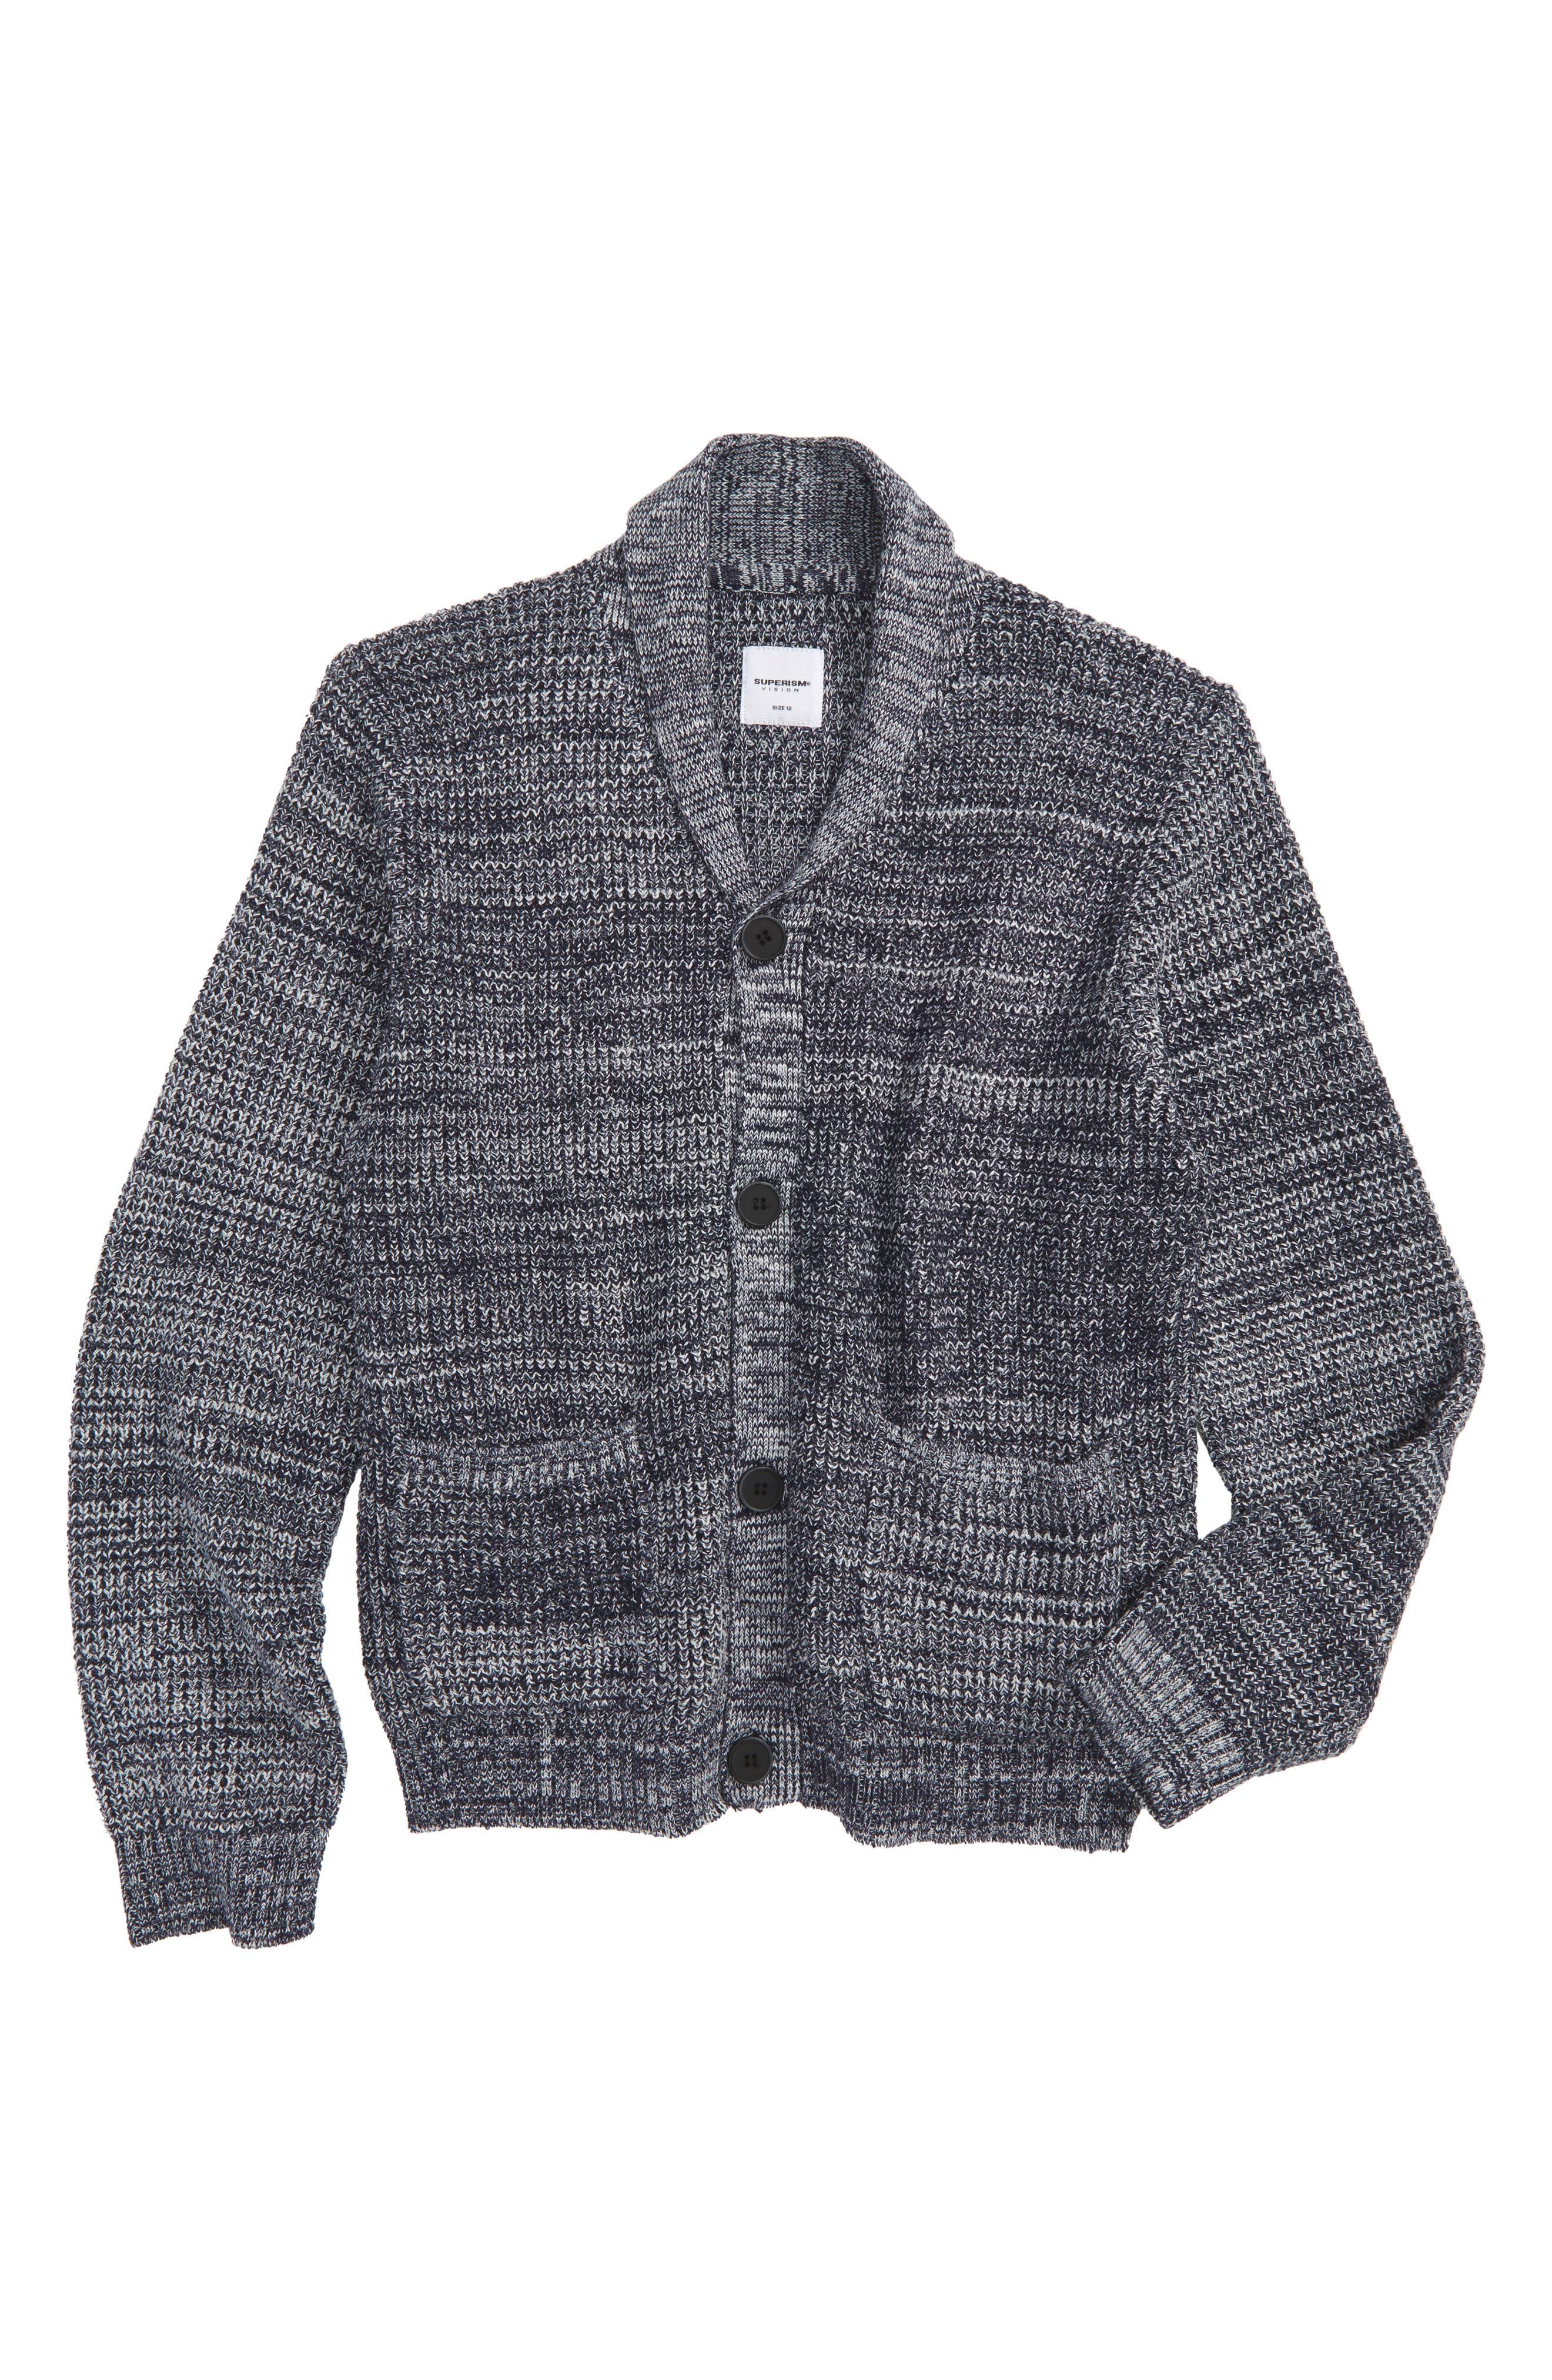 Cruz Cardigan Sweater,                             Main thumbnail 1, color,                             410